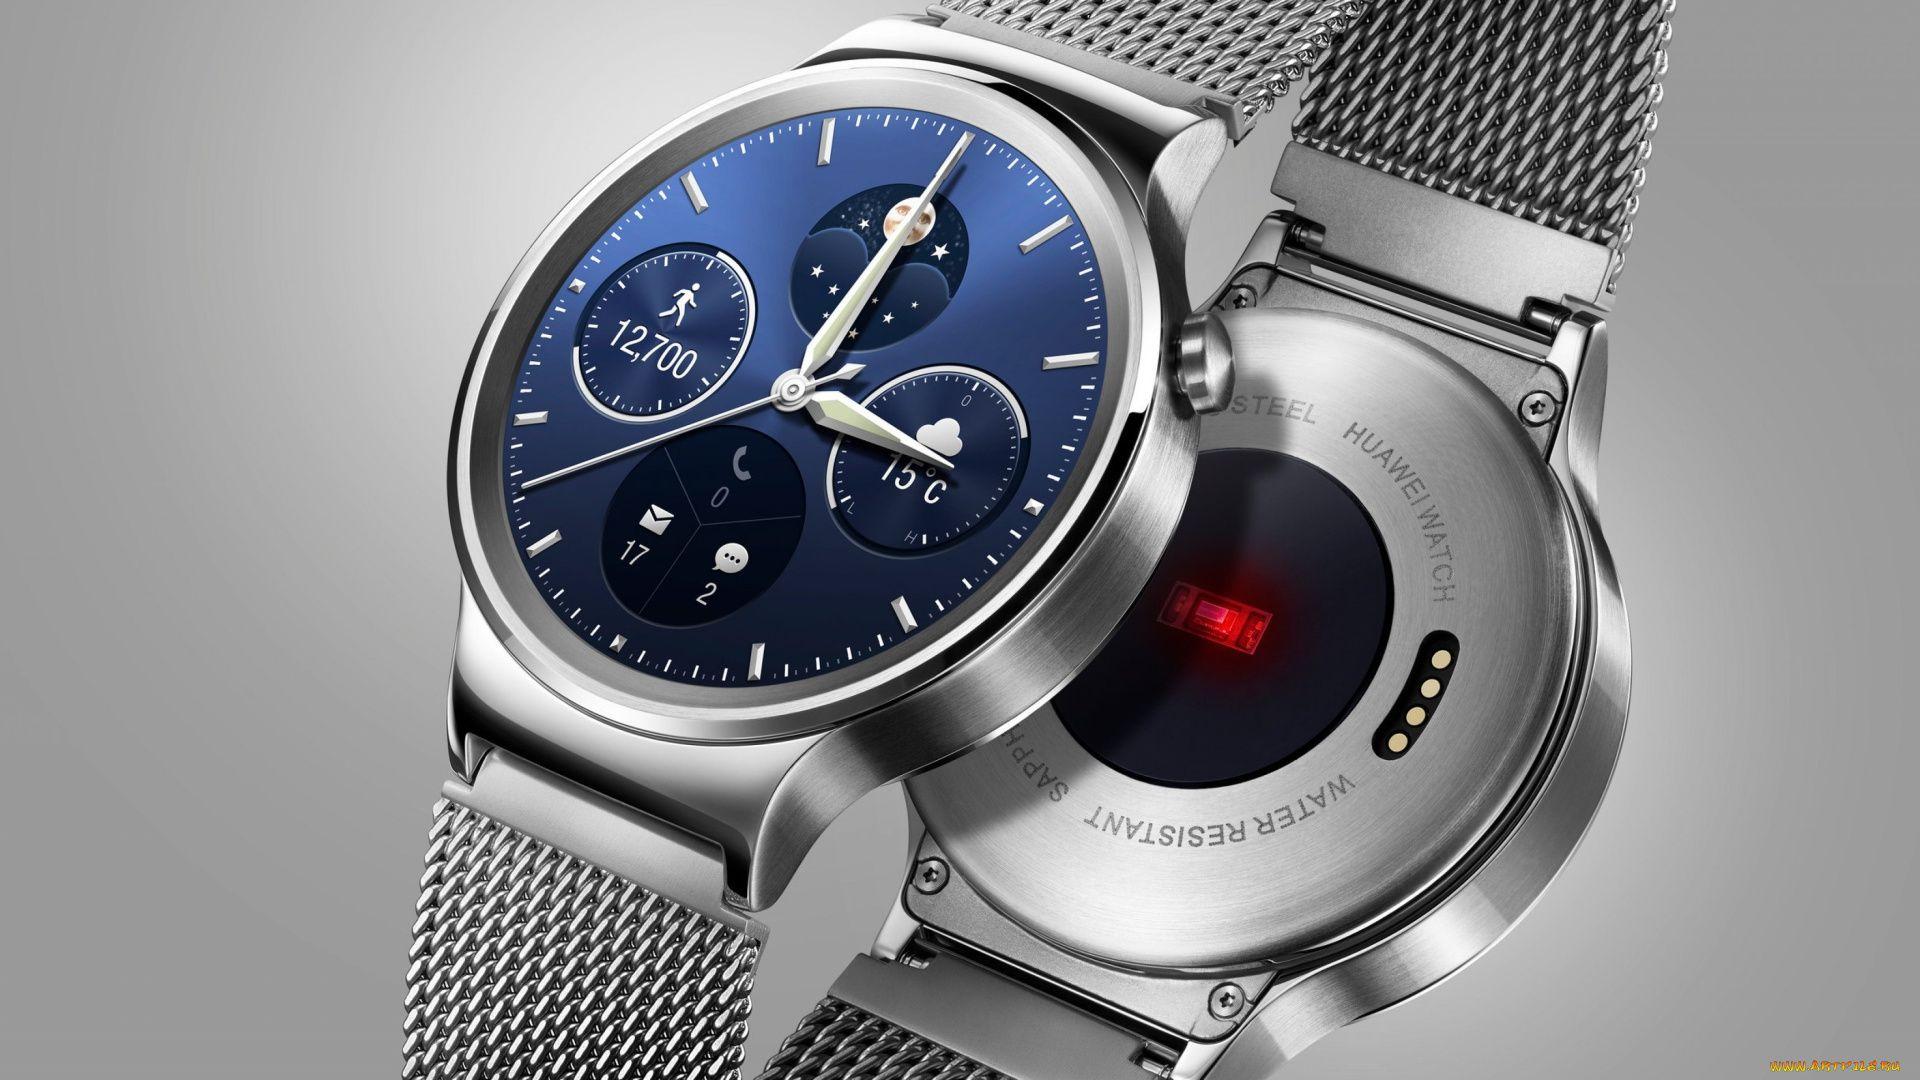 Smartwatch nice wallpaper